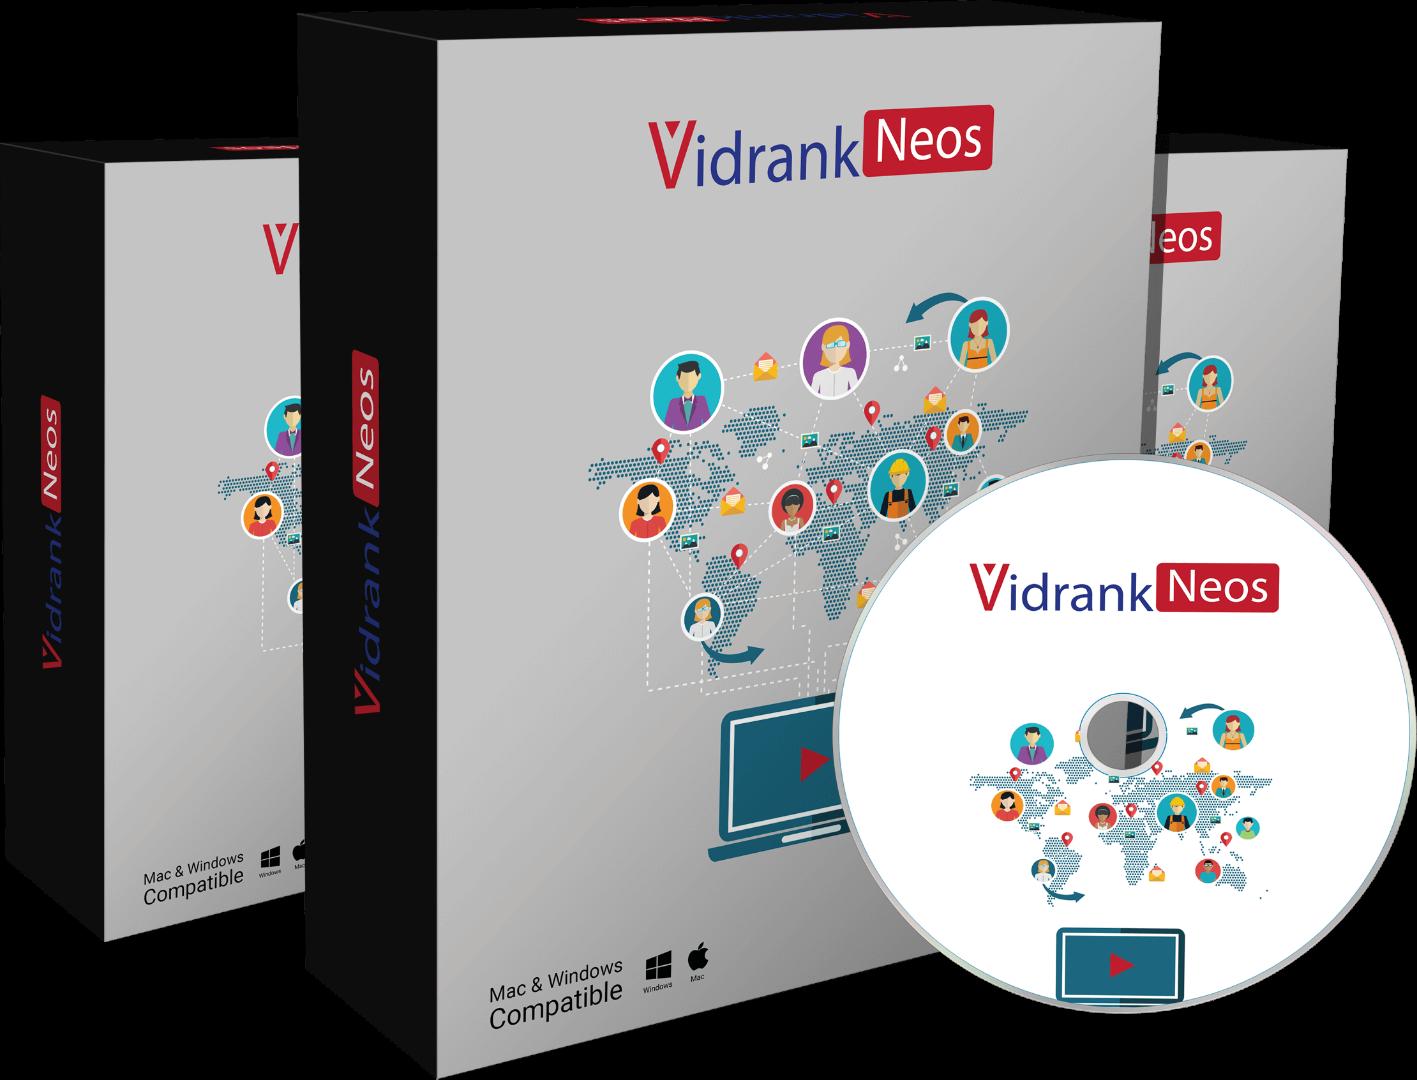 vidrank-neos1 (1).png